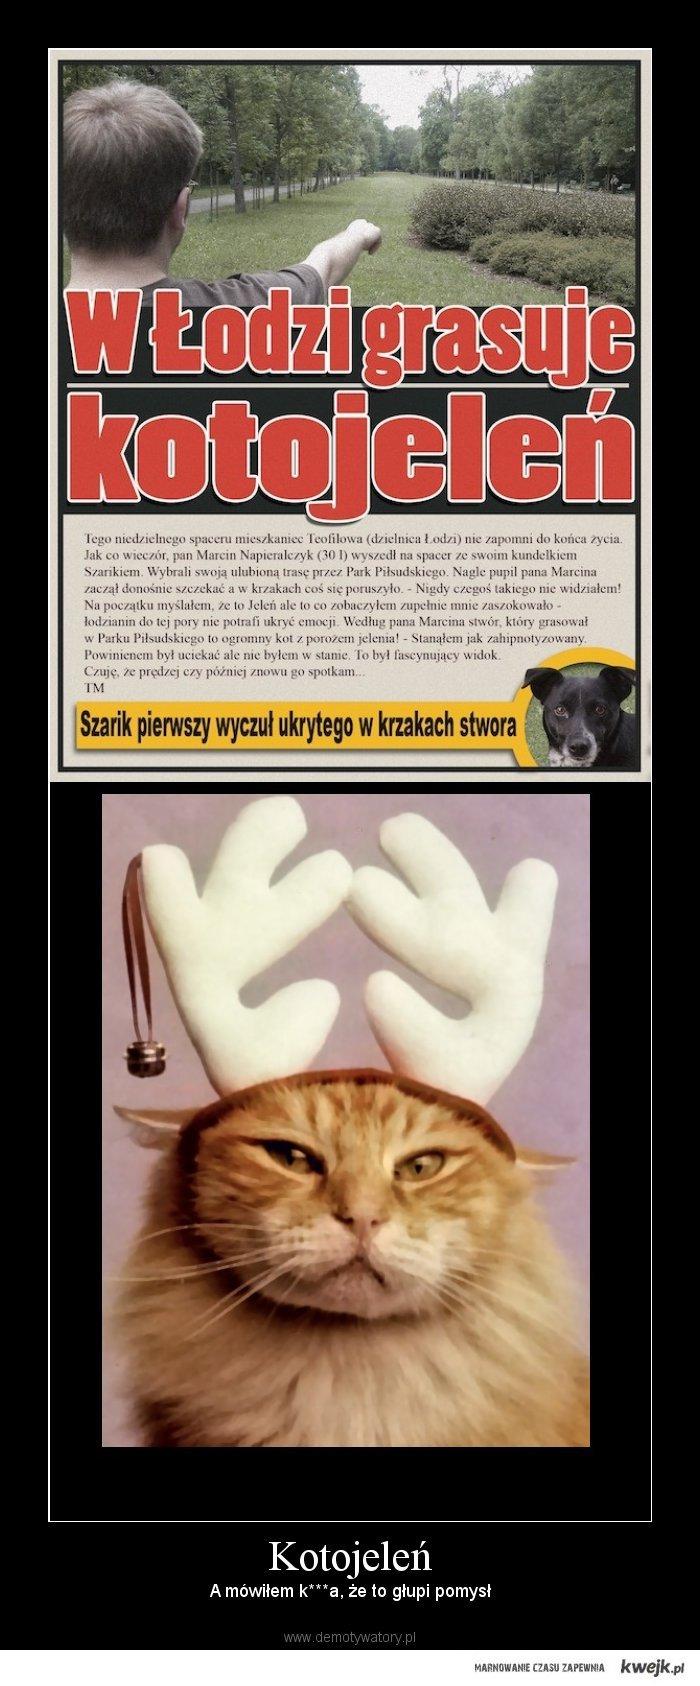 Kotojeleń - głupi pomysł